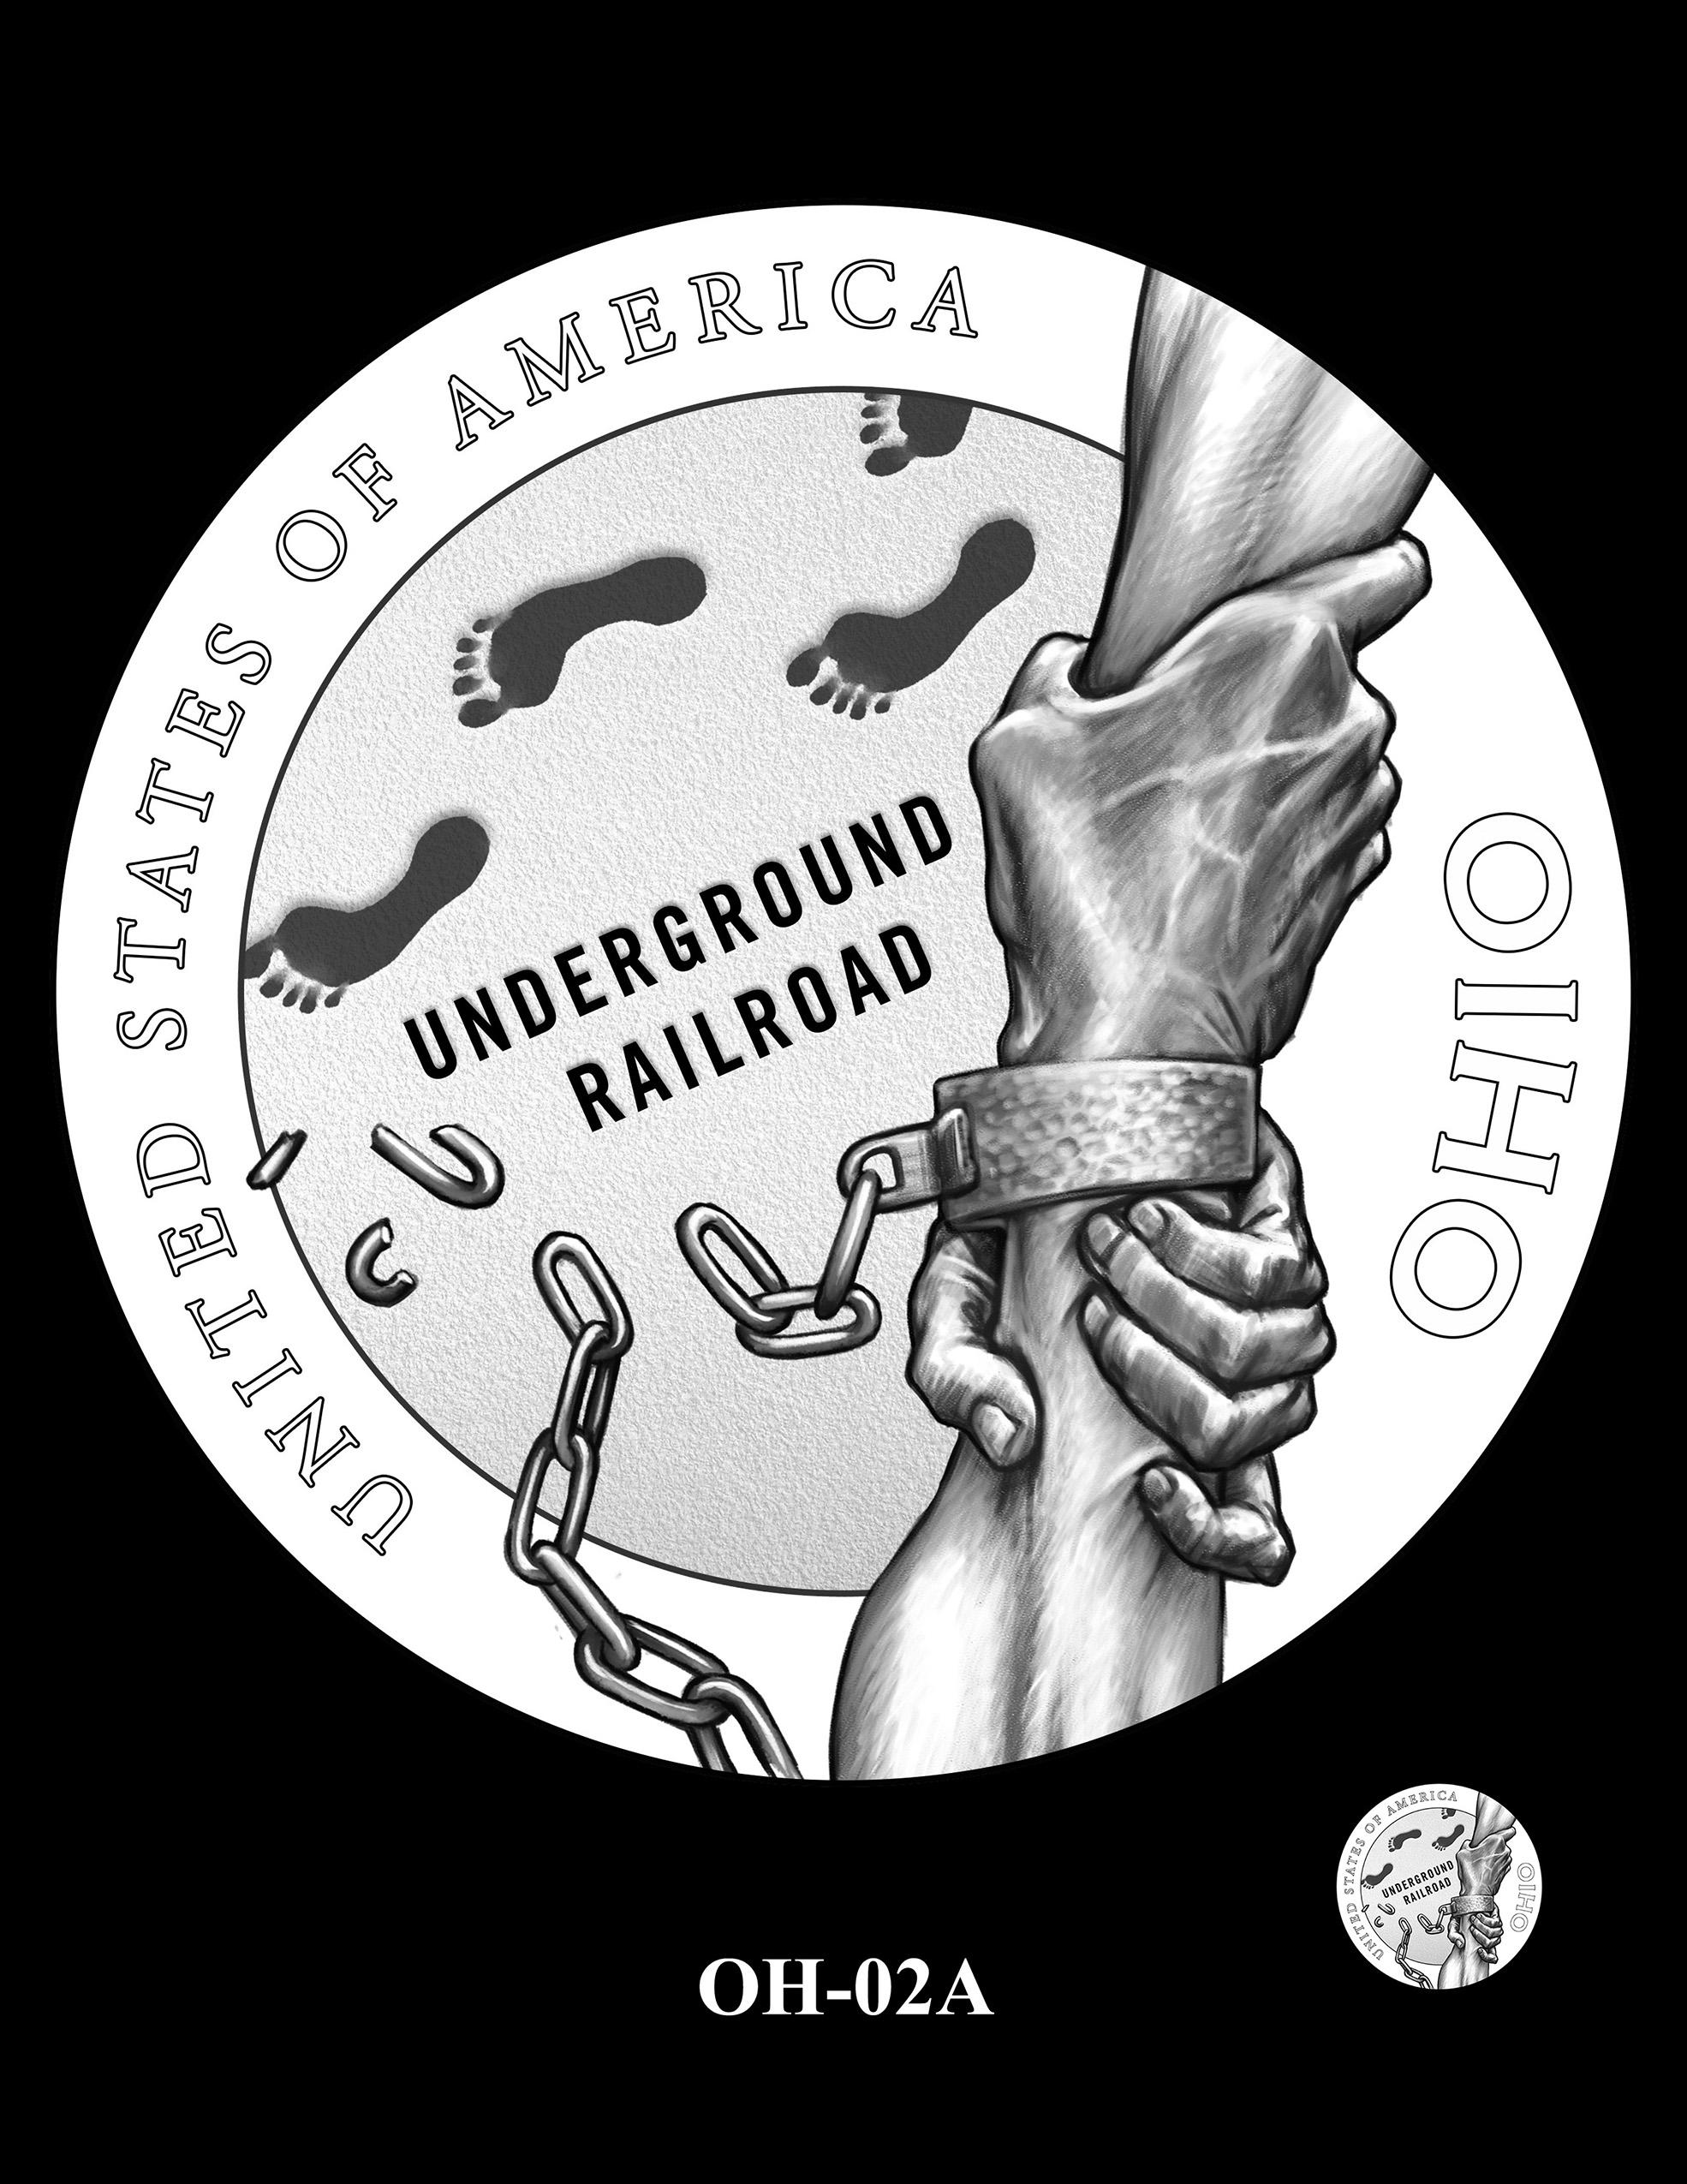 OH-02A -- 2023 American Innovation $1 Coin Program - Ohio